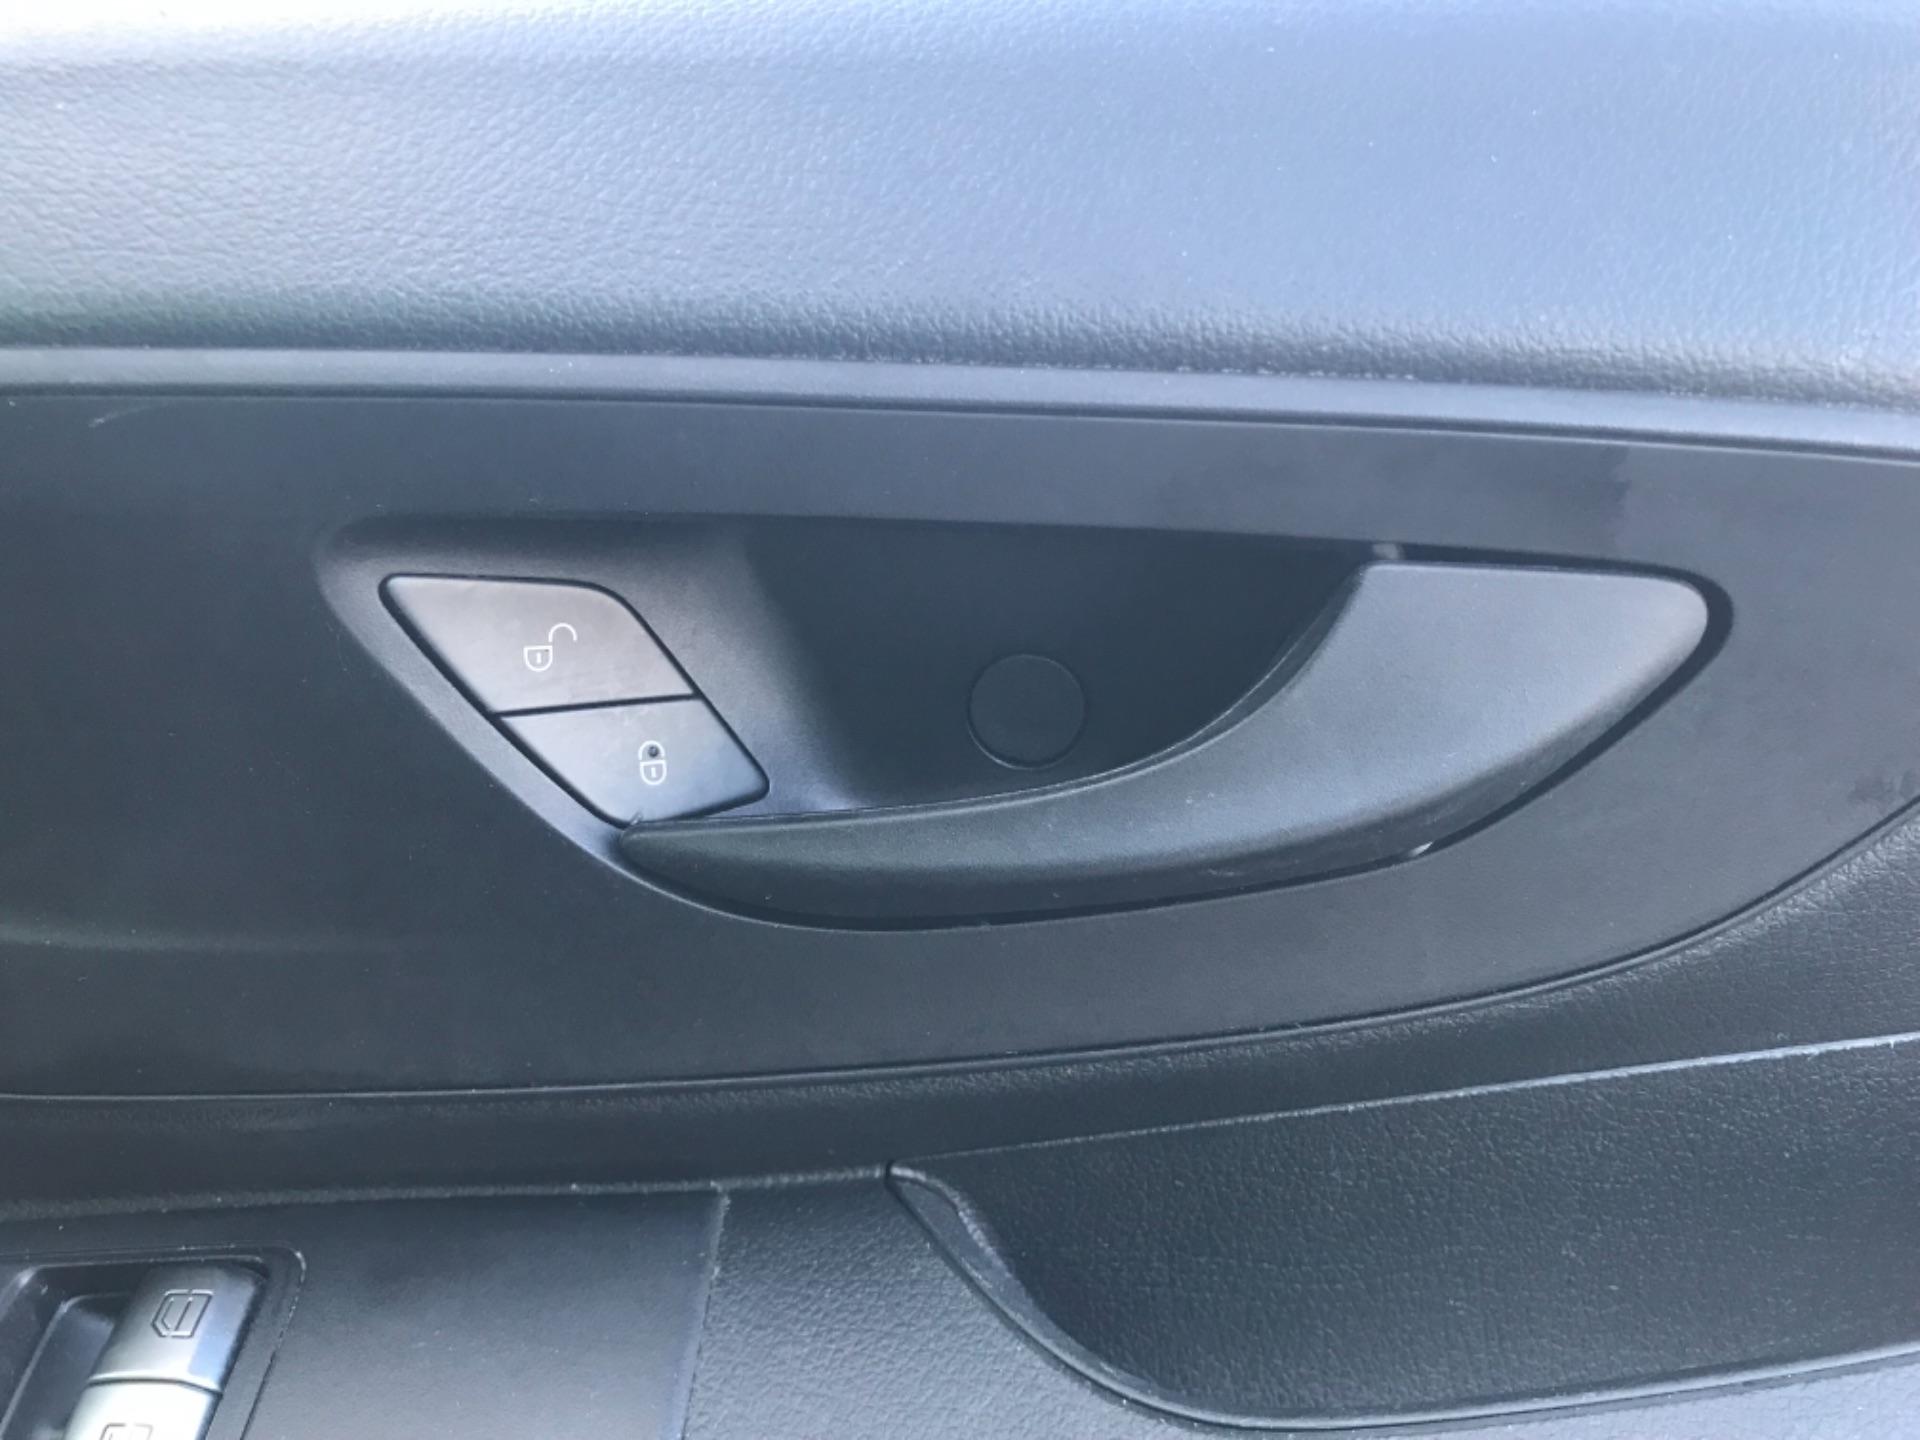 2017 Mercedes-Benz Vito LONG 111 CDI VAN EURO 6  (KM67BKY) Image 21